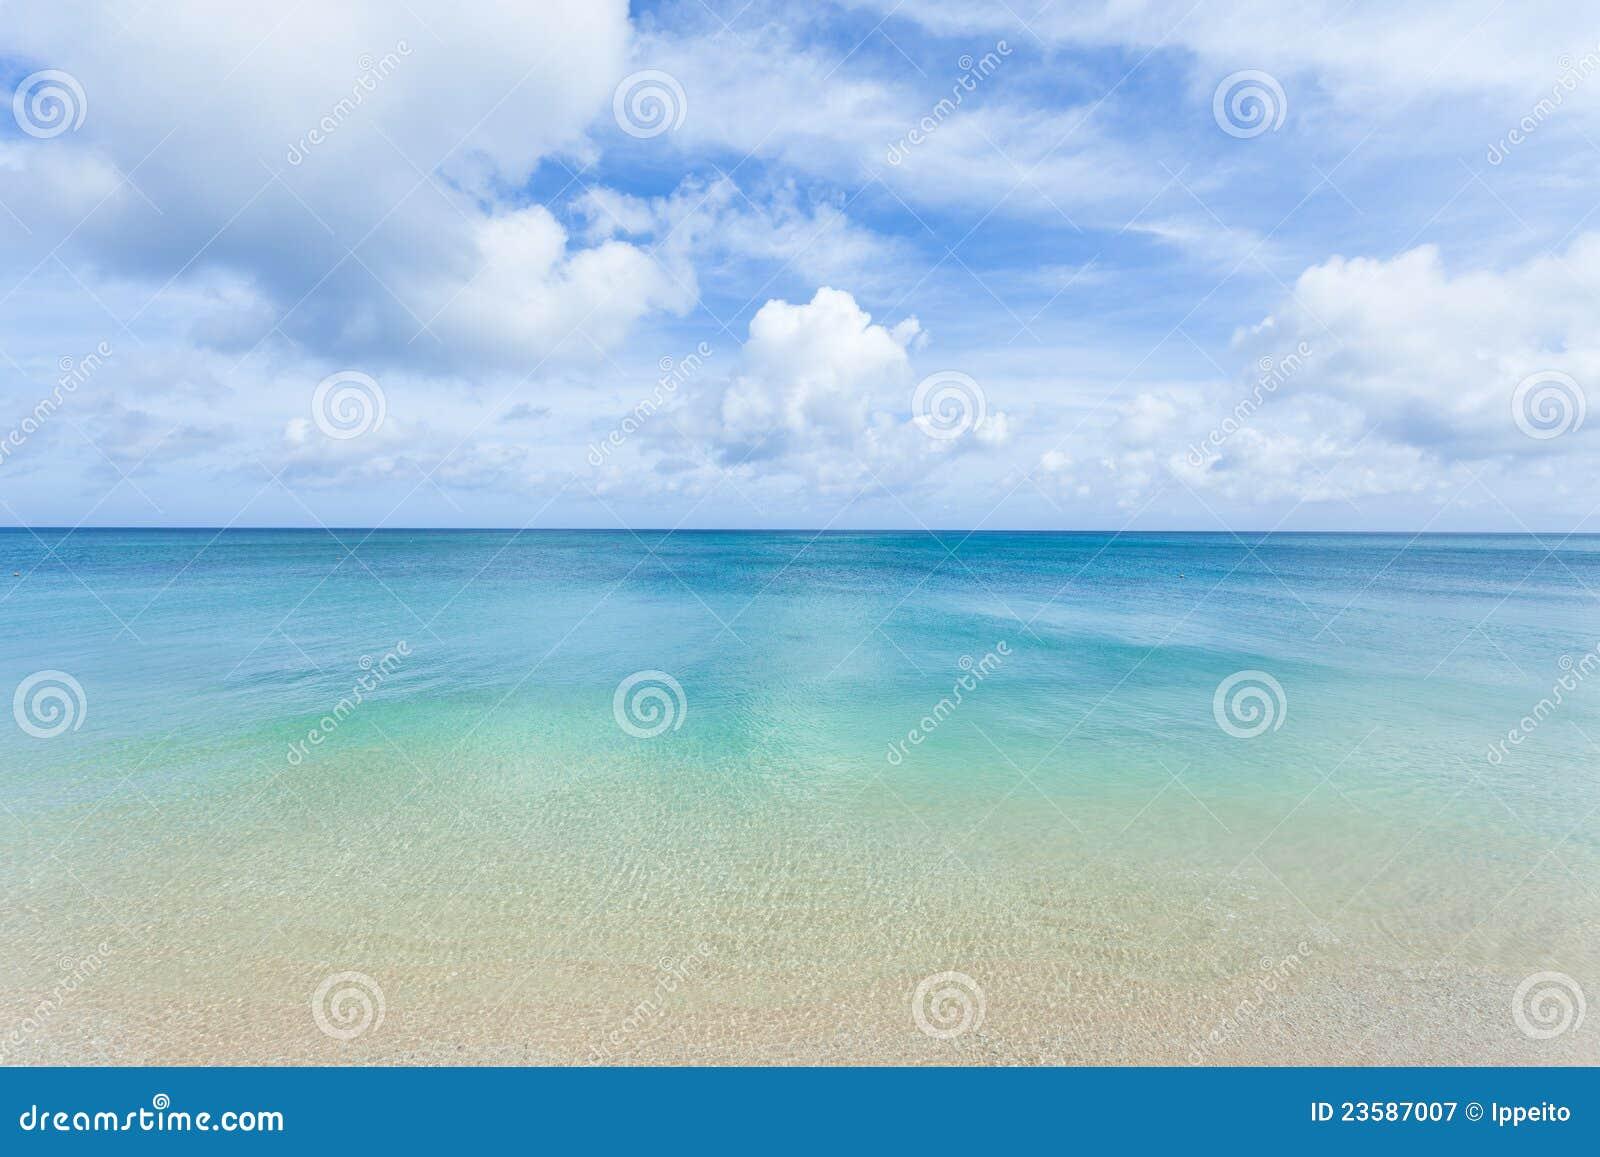 Coral Azul Praia ~ Água Azul Desobstruída, Praia Tropical E Horizonte Fotografia de Stock Royalty Free Imagem